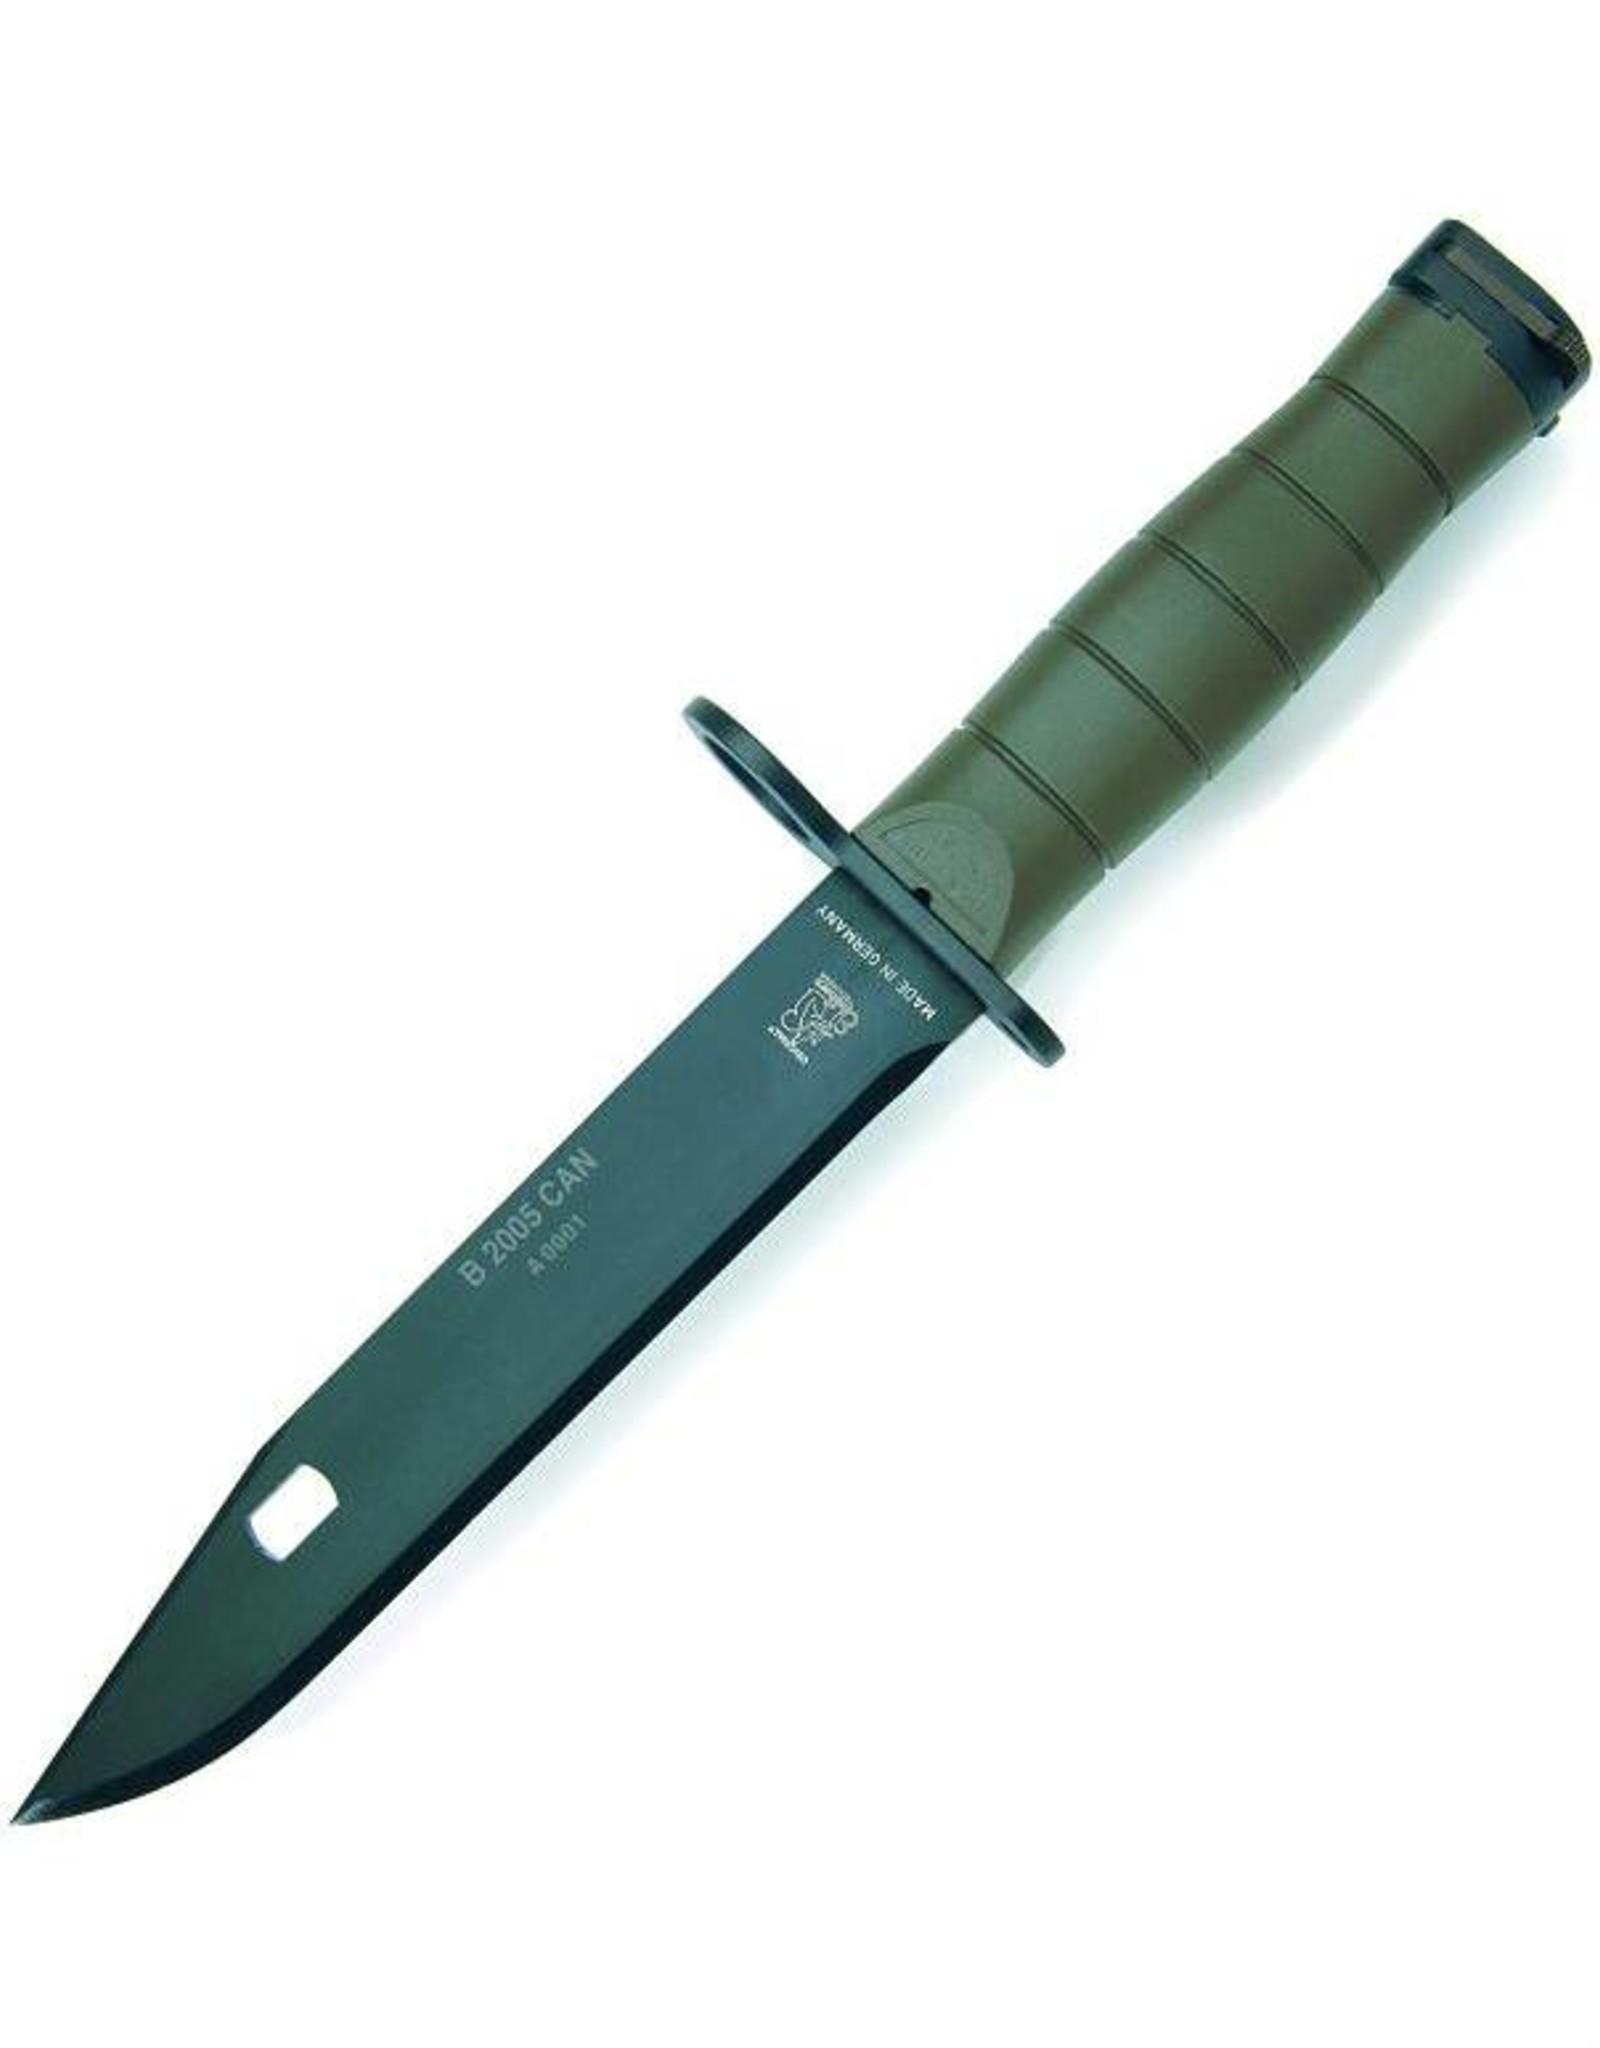 Original Eickhorn Solingen Military Bayonet B2005